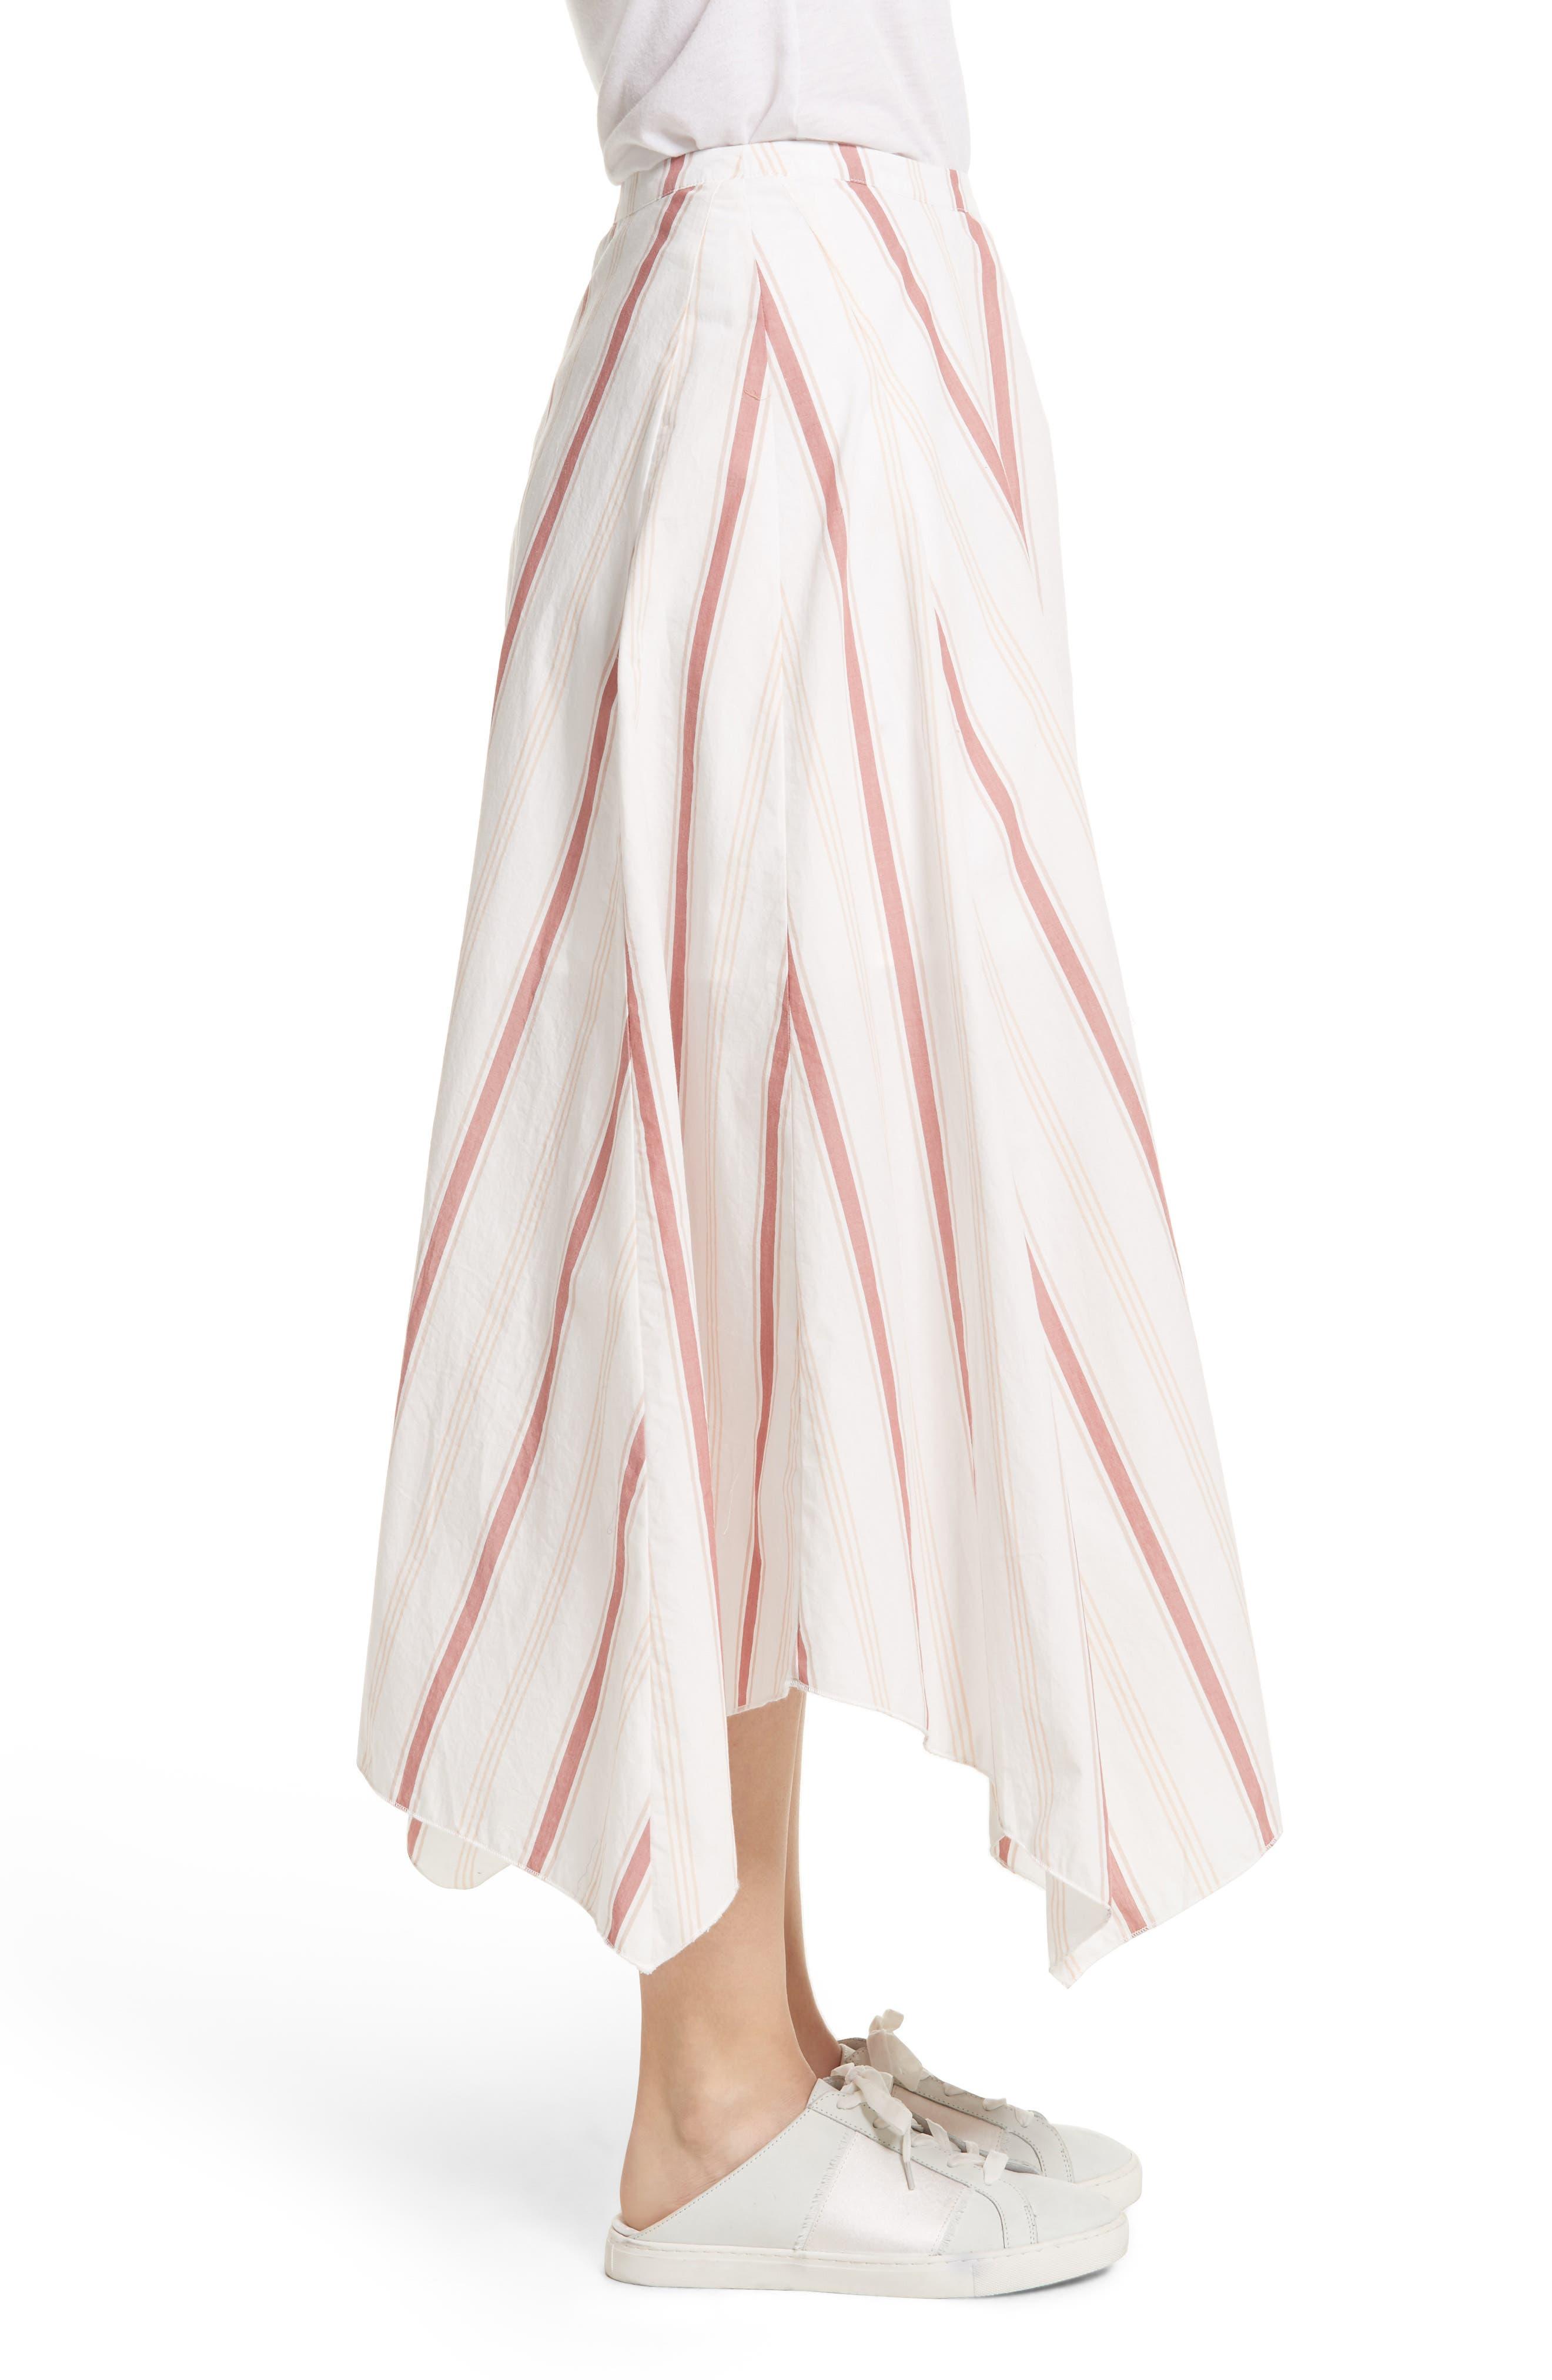 Hooked on Your Love Midi Skirt,                             Alternate thumbnail 3, color,                             903